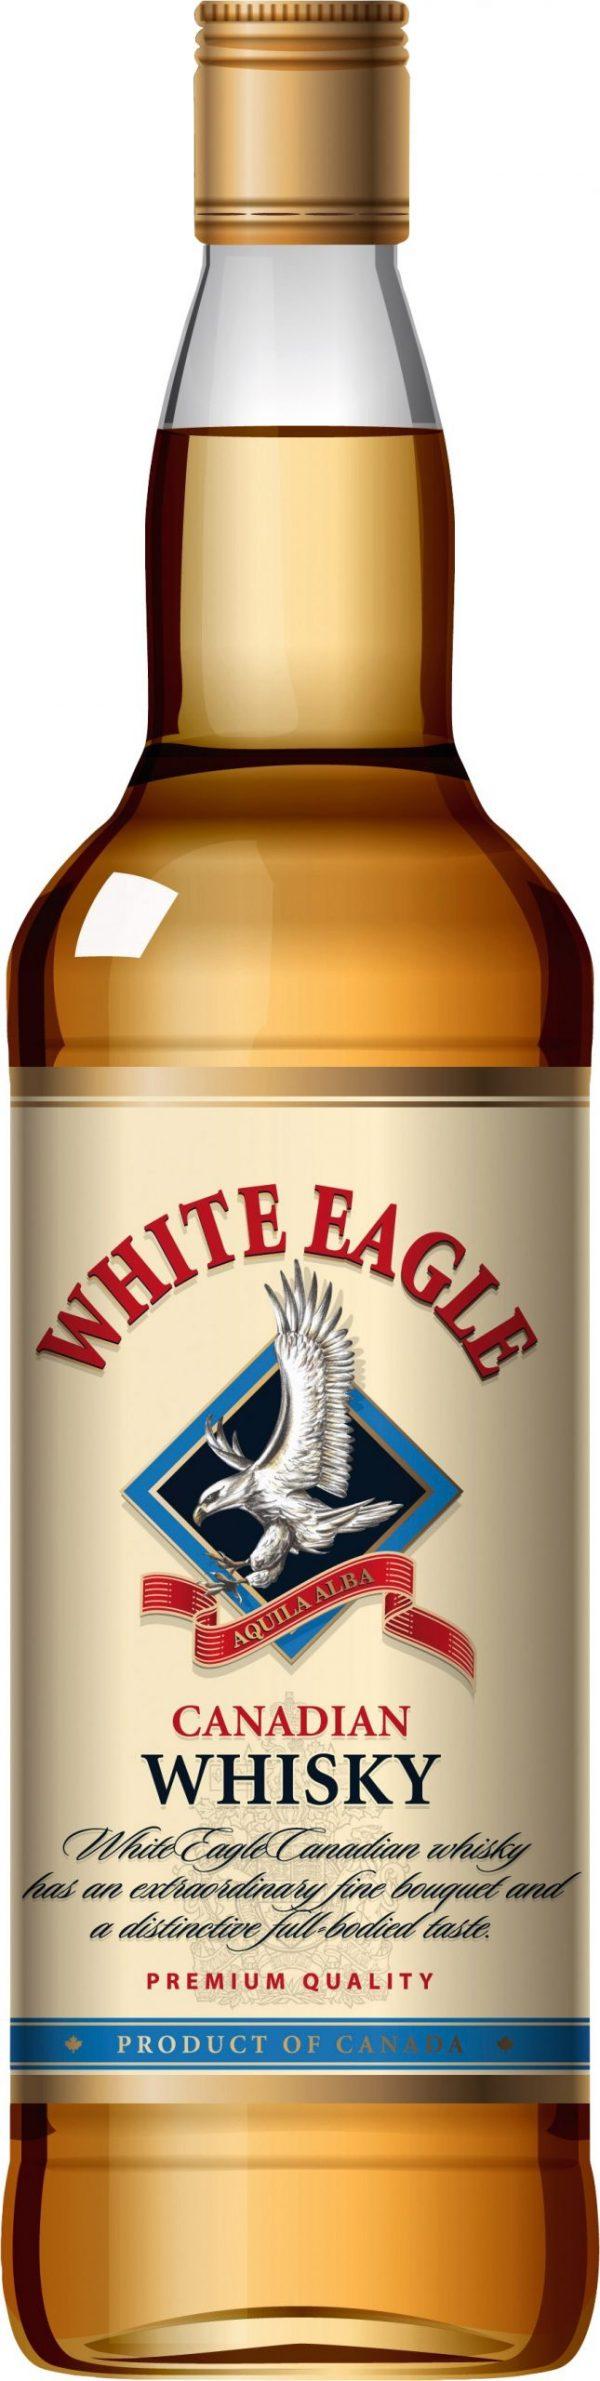 FLES WHITE EAGLE CANADIAN WHISKY 1,00 LTR-0